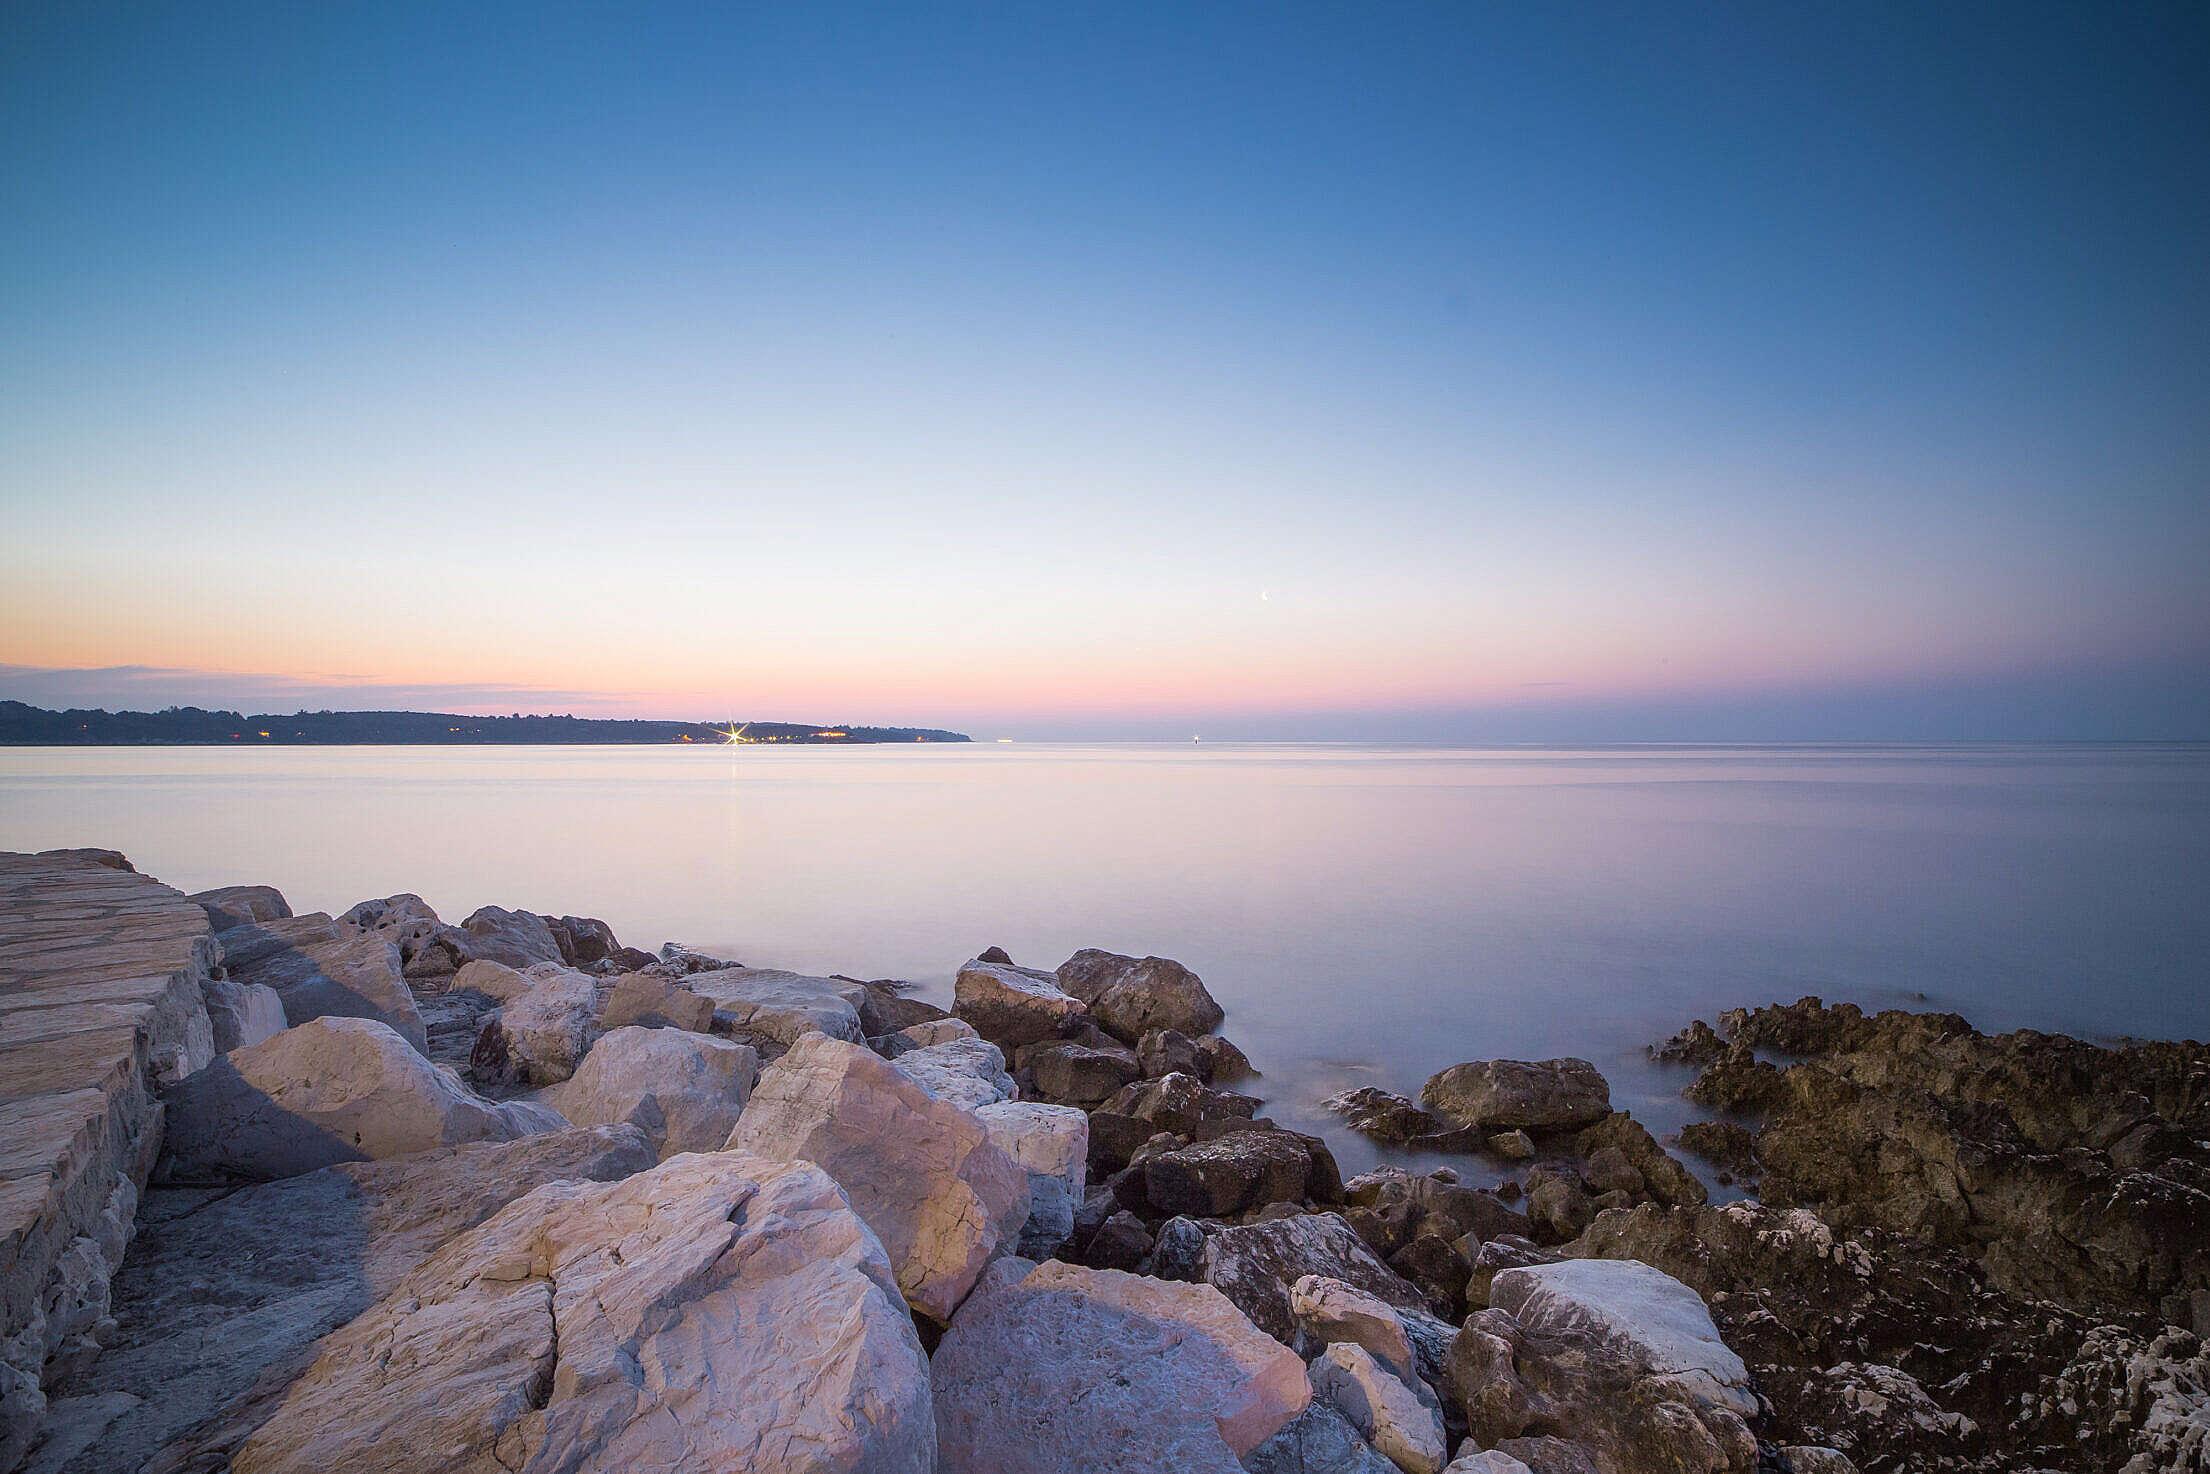 Beautiful Sunset Over Seaside Rocks Free Stock Photo